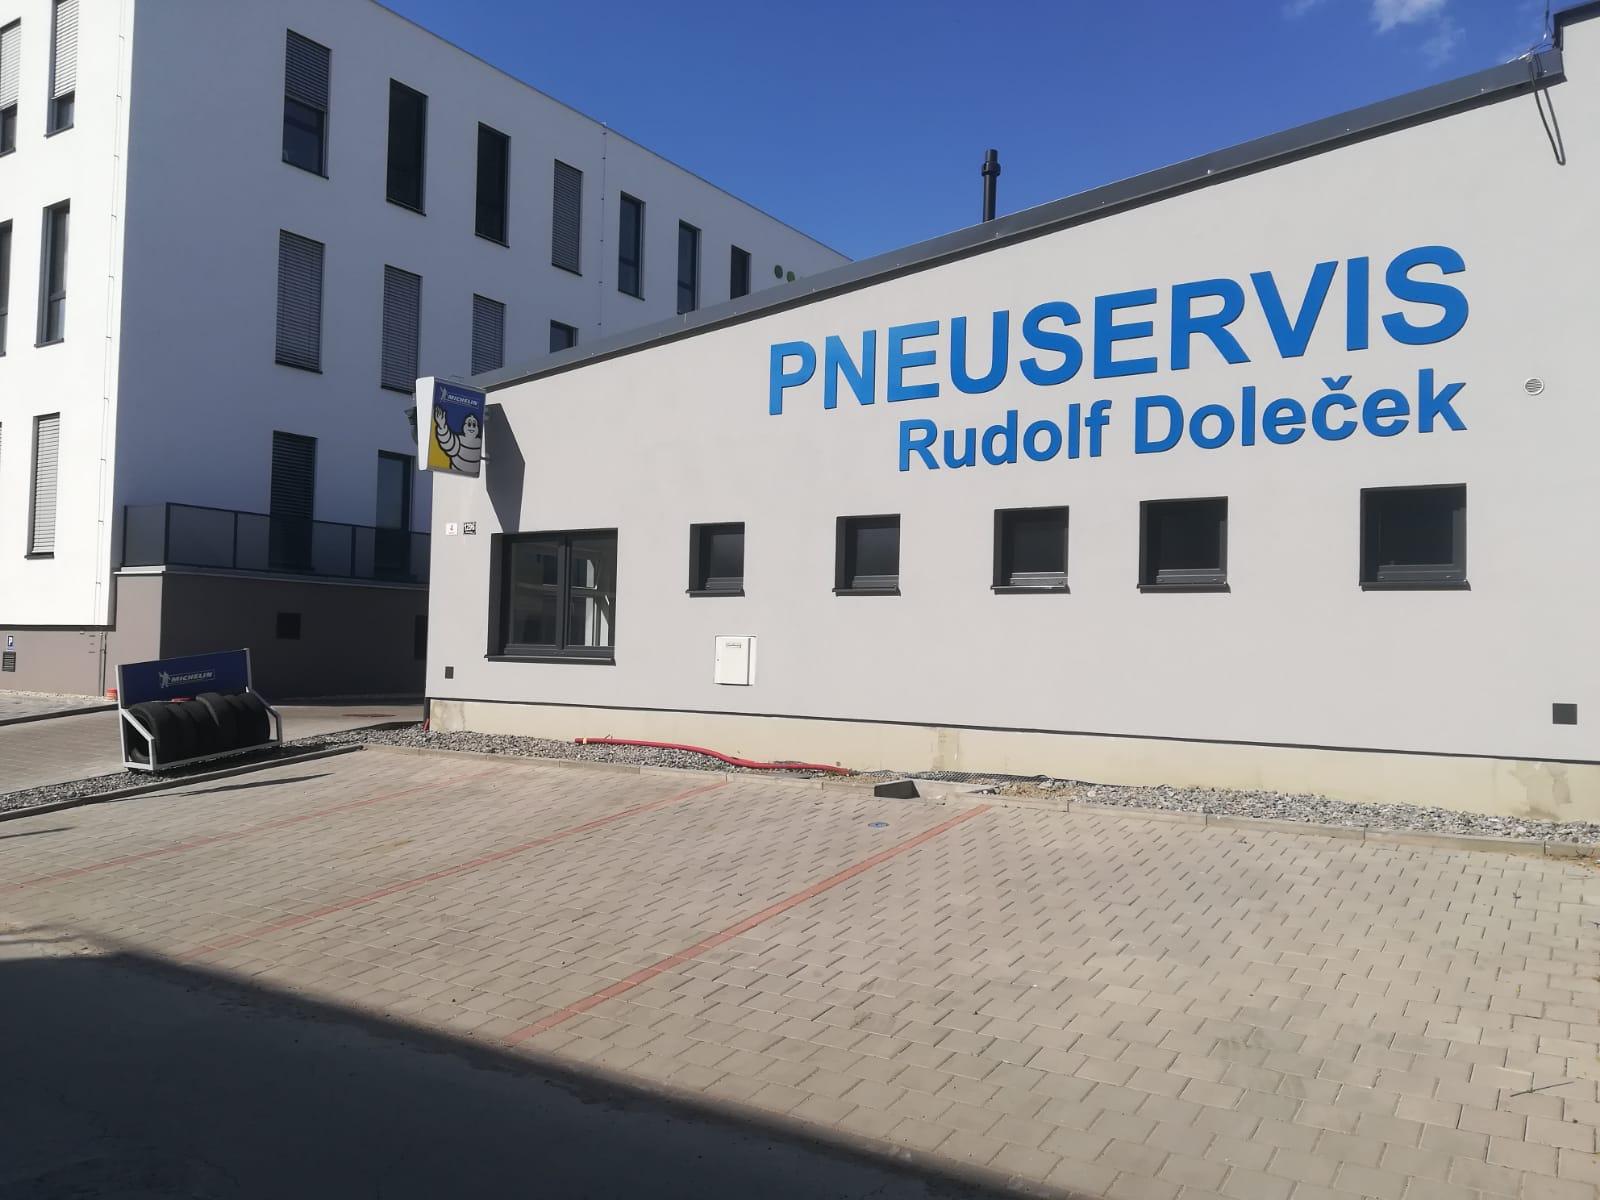 Pneuservis Brno - Pneuservis Doleček